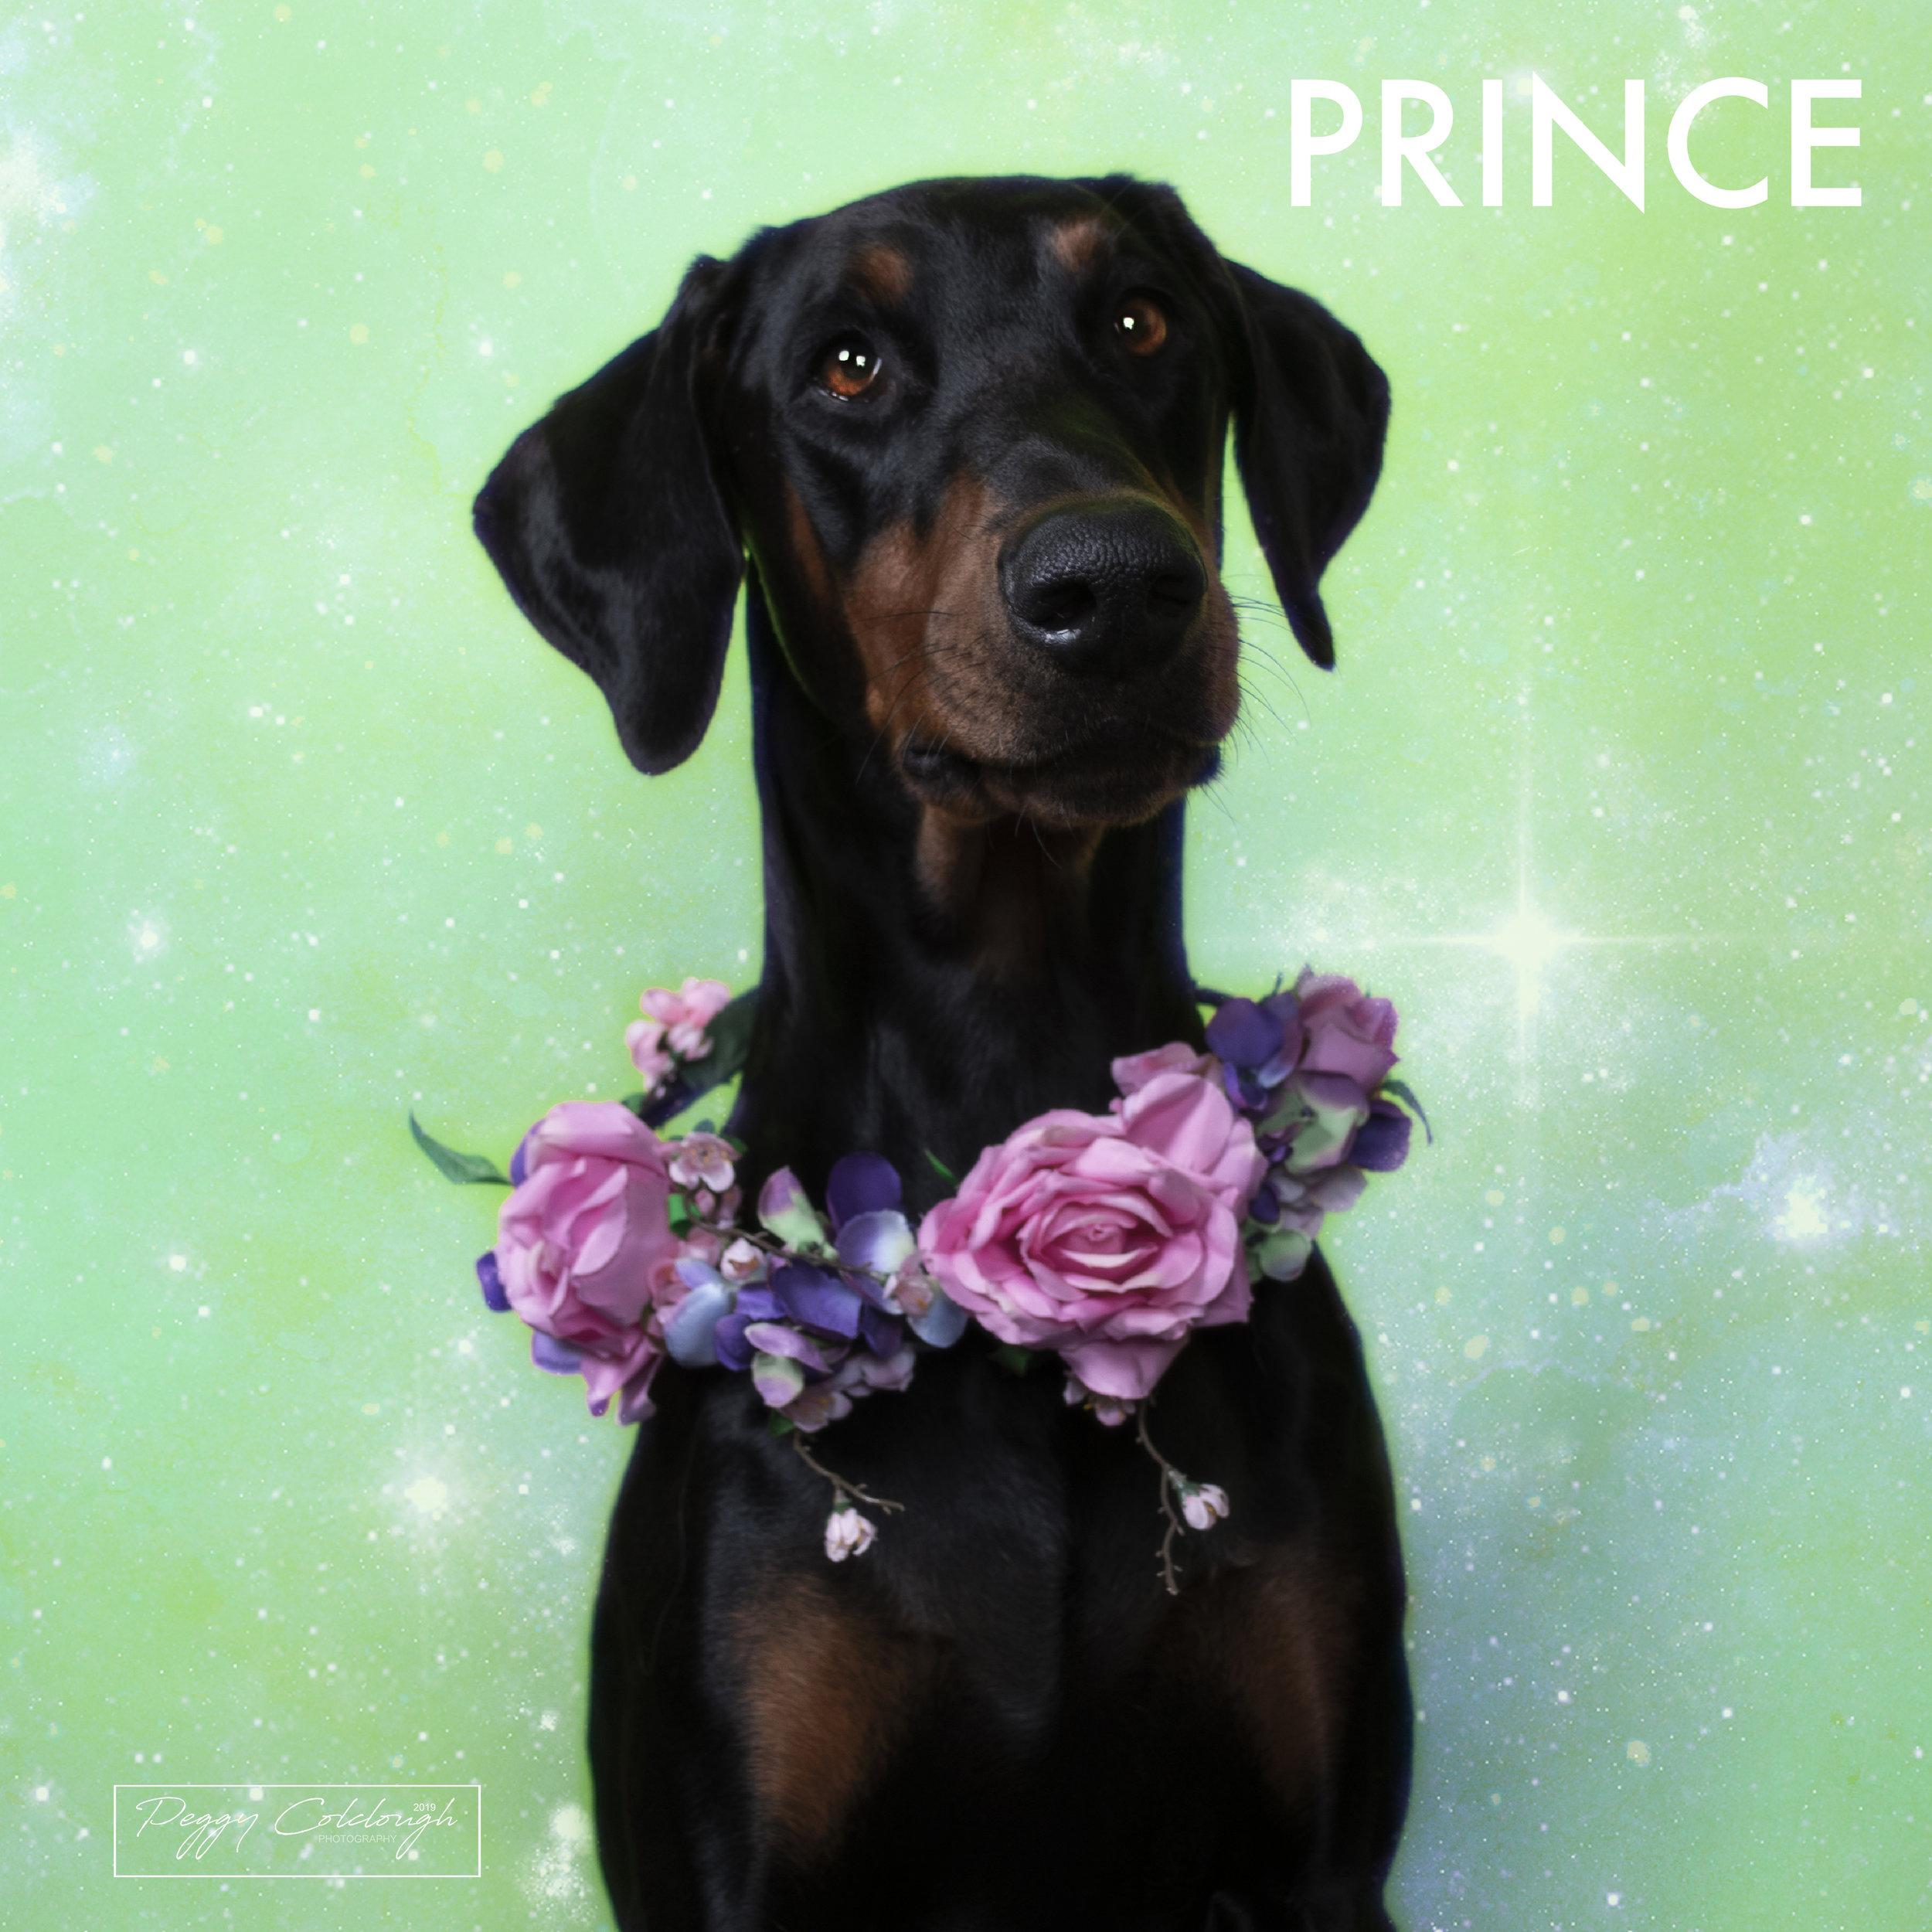 30. PRINCE.jpg